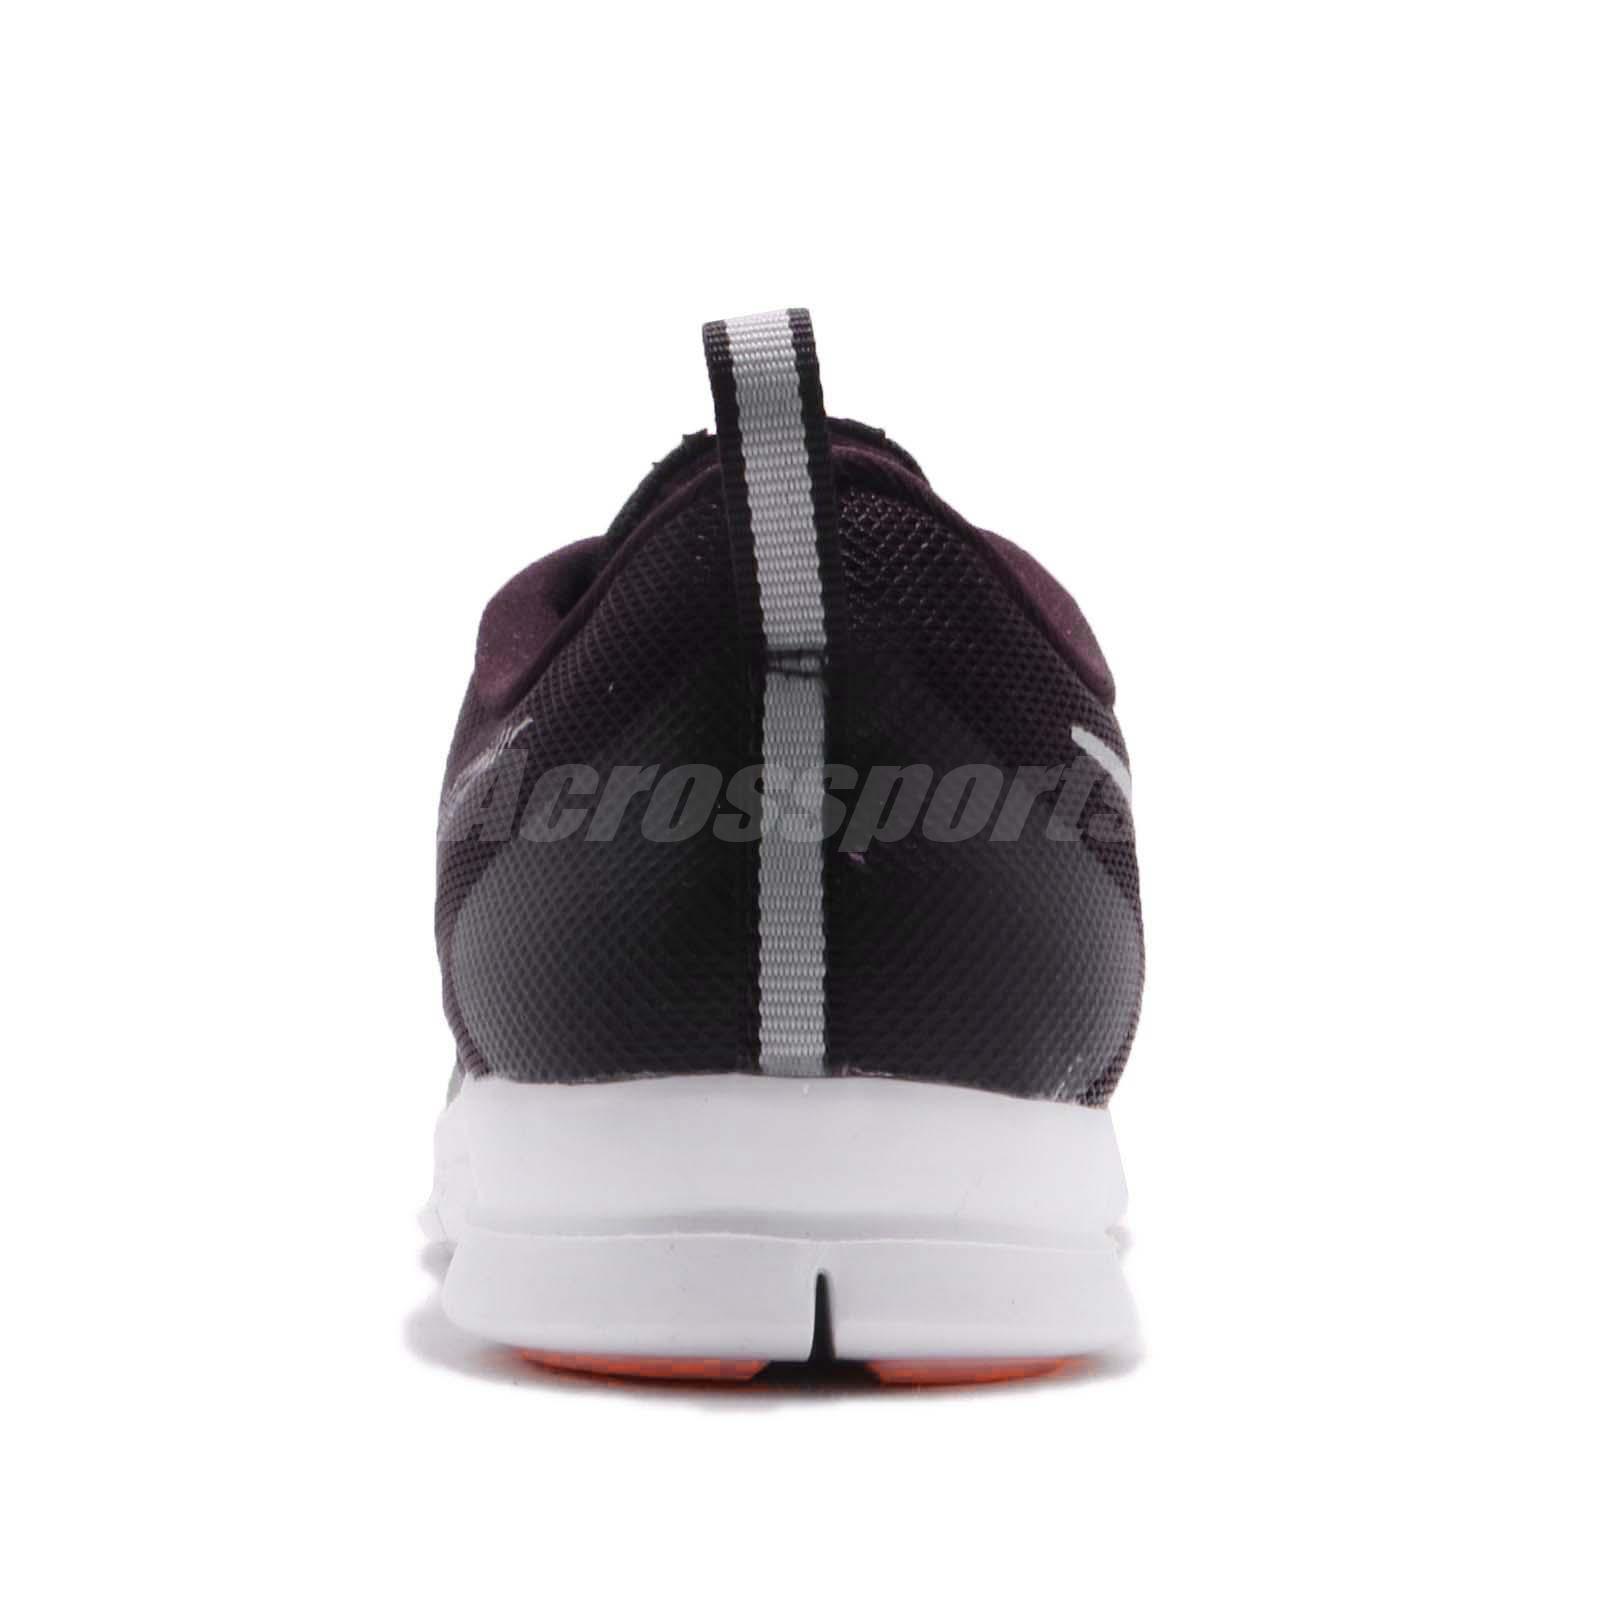 16ad61438b Nike Wmns Flex Essential TR Burgundy Ash Women Cross Training Shoes ...